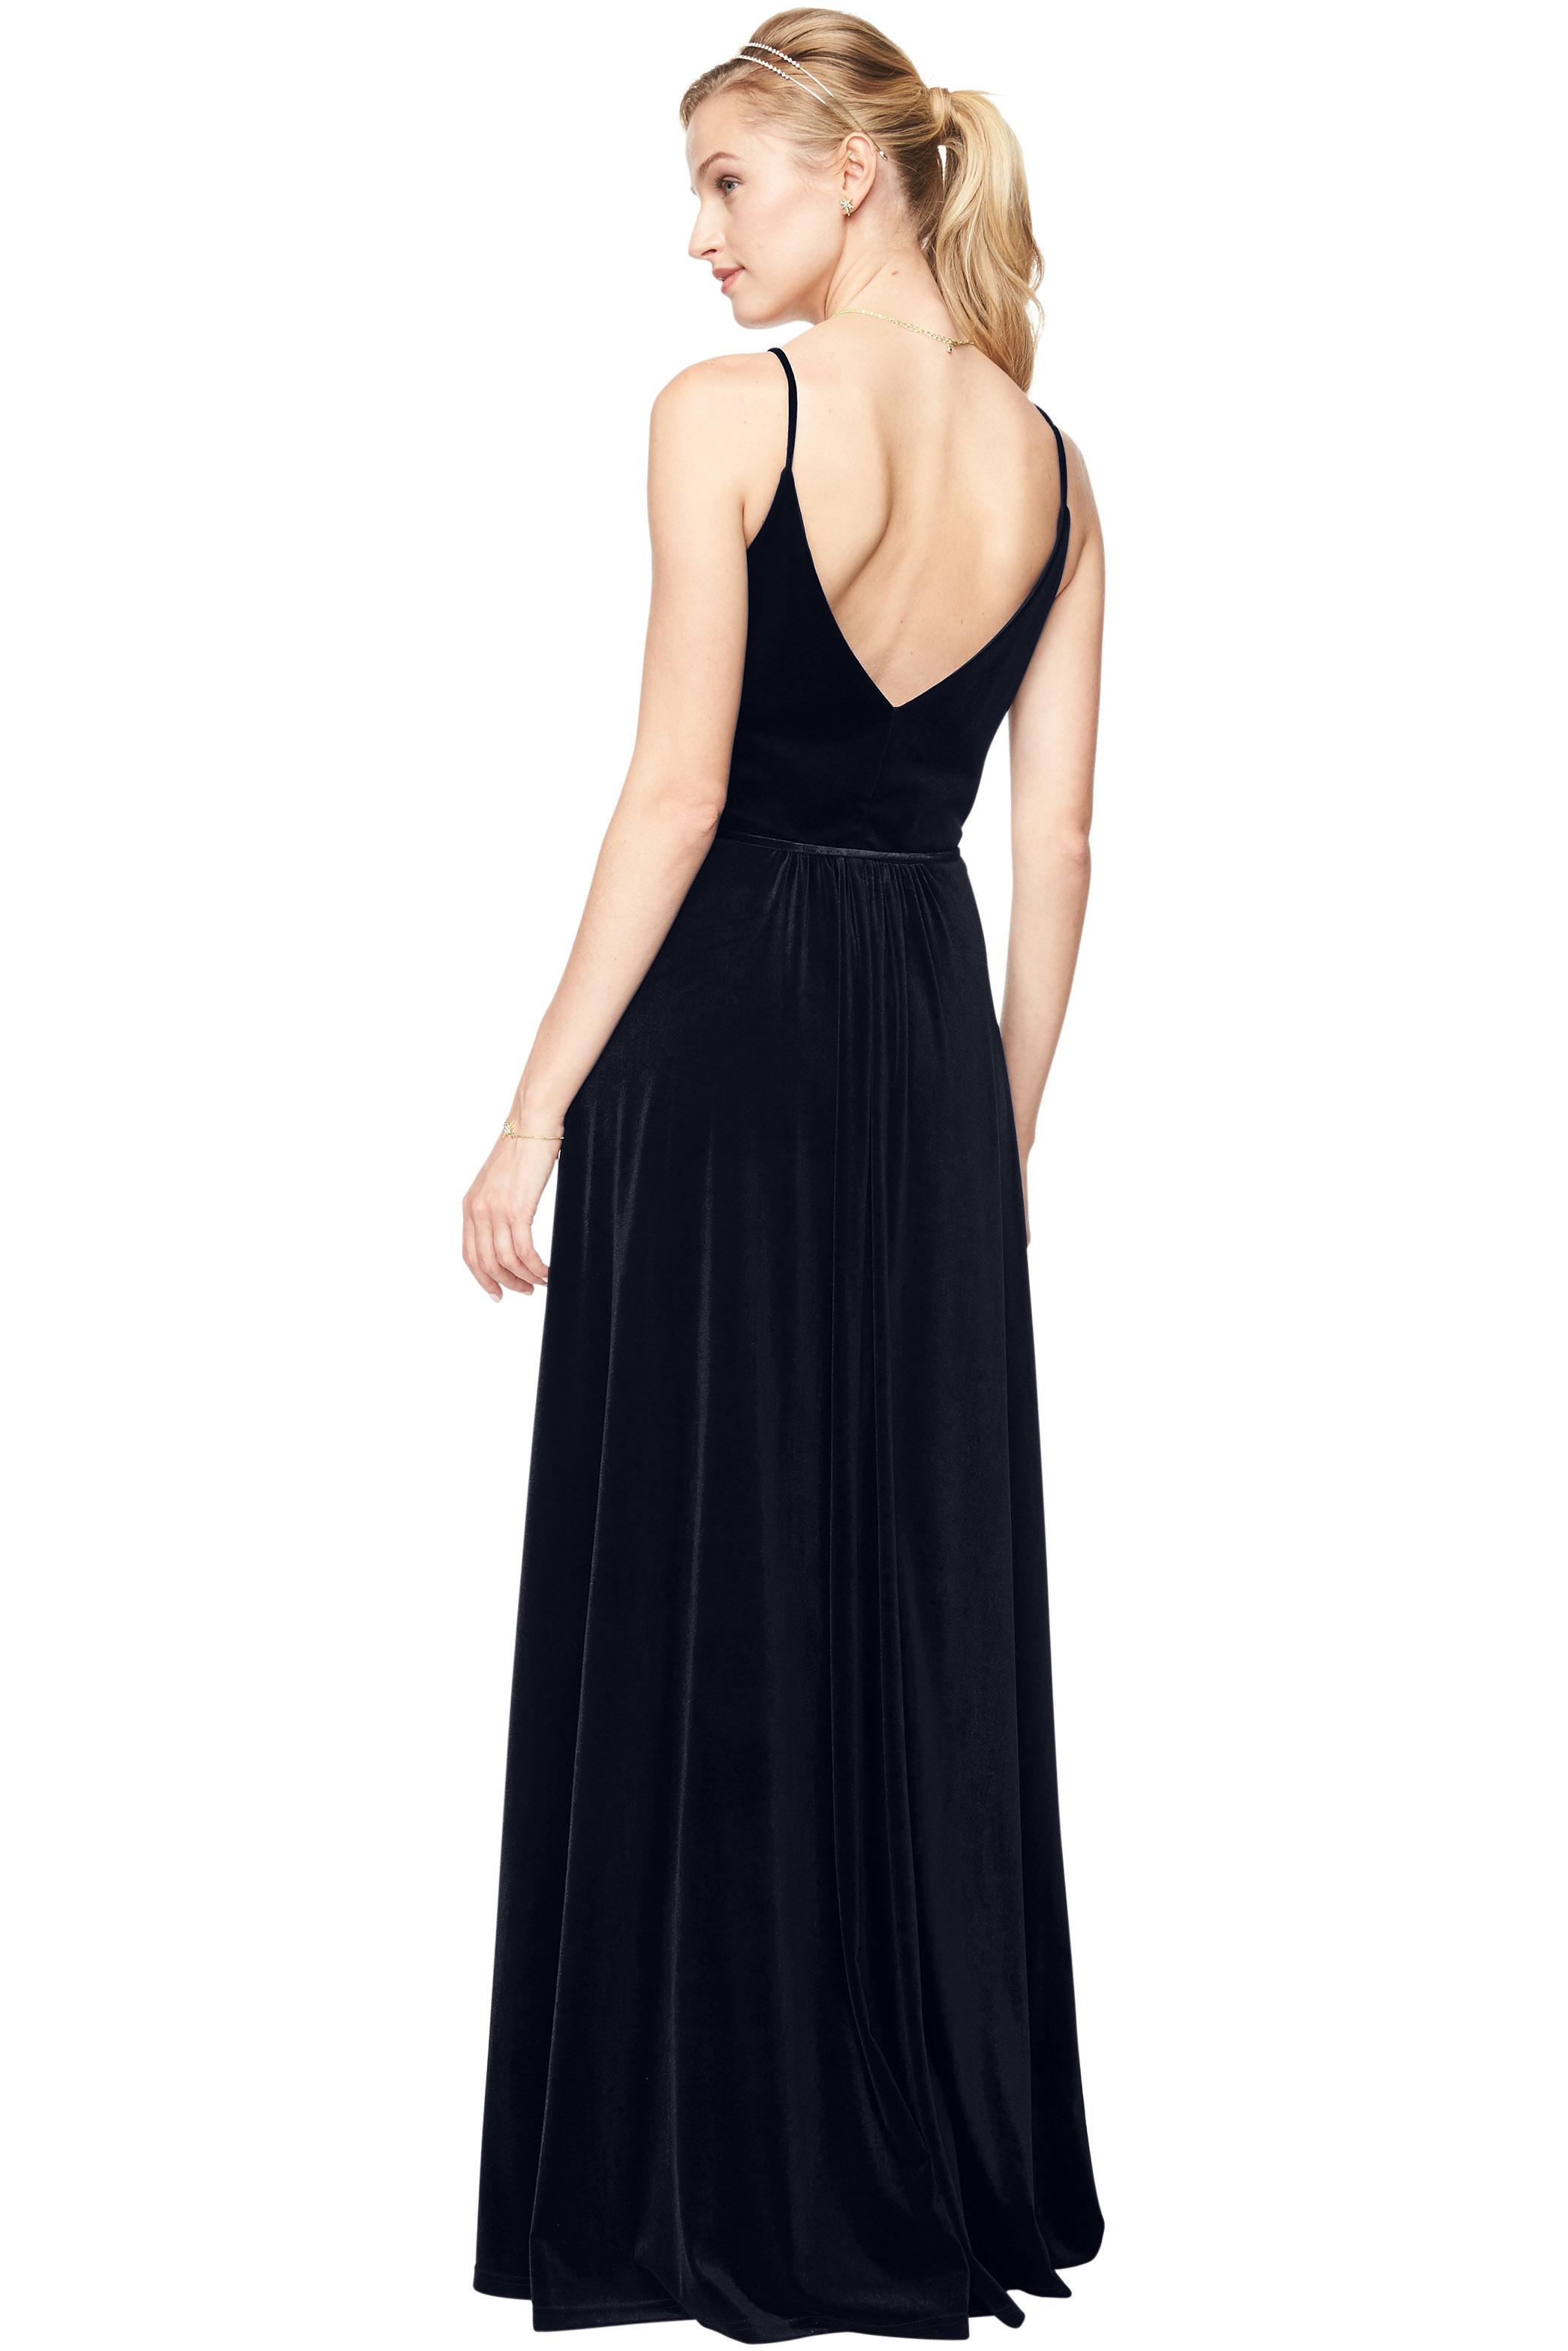 Bill Levkoff MIDNIGHT Stretch Velvet V-Neck A-Line gown, $220.00 Back